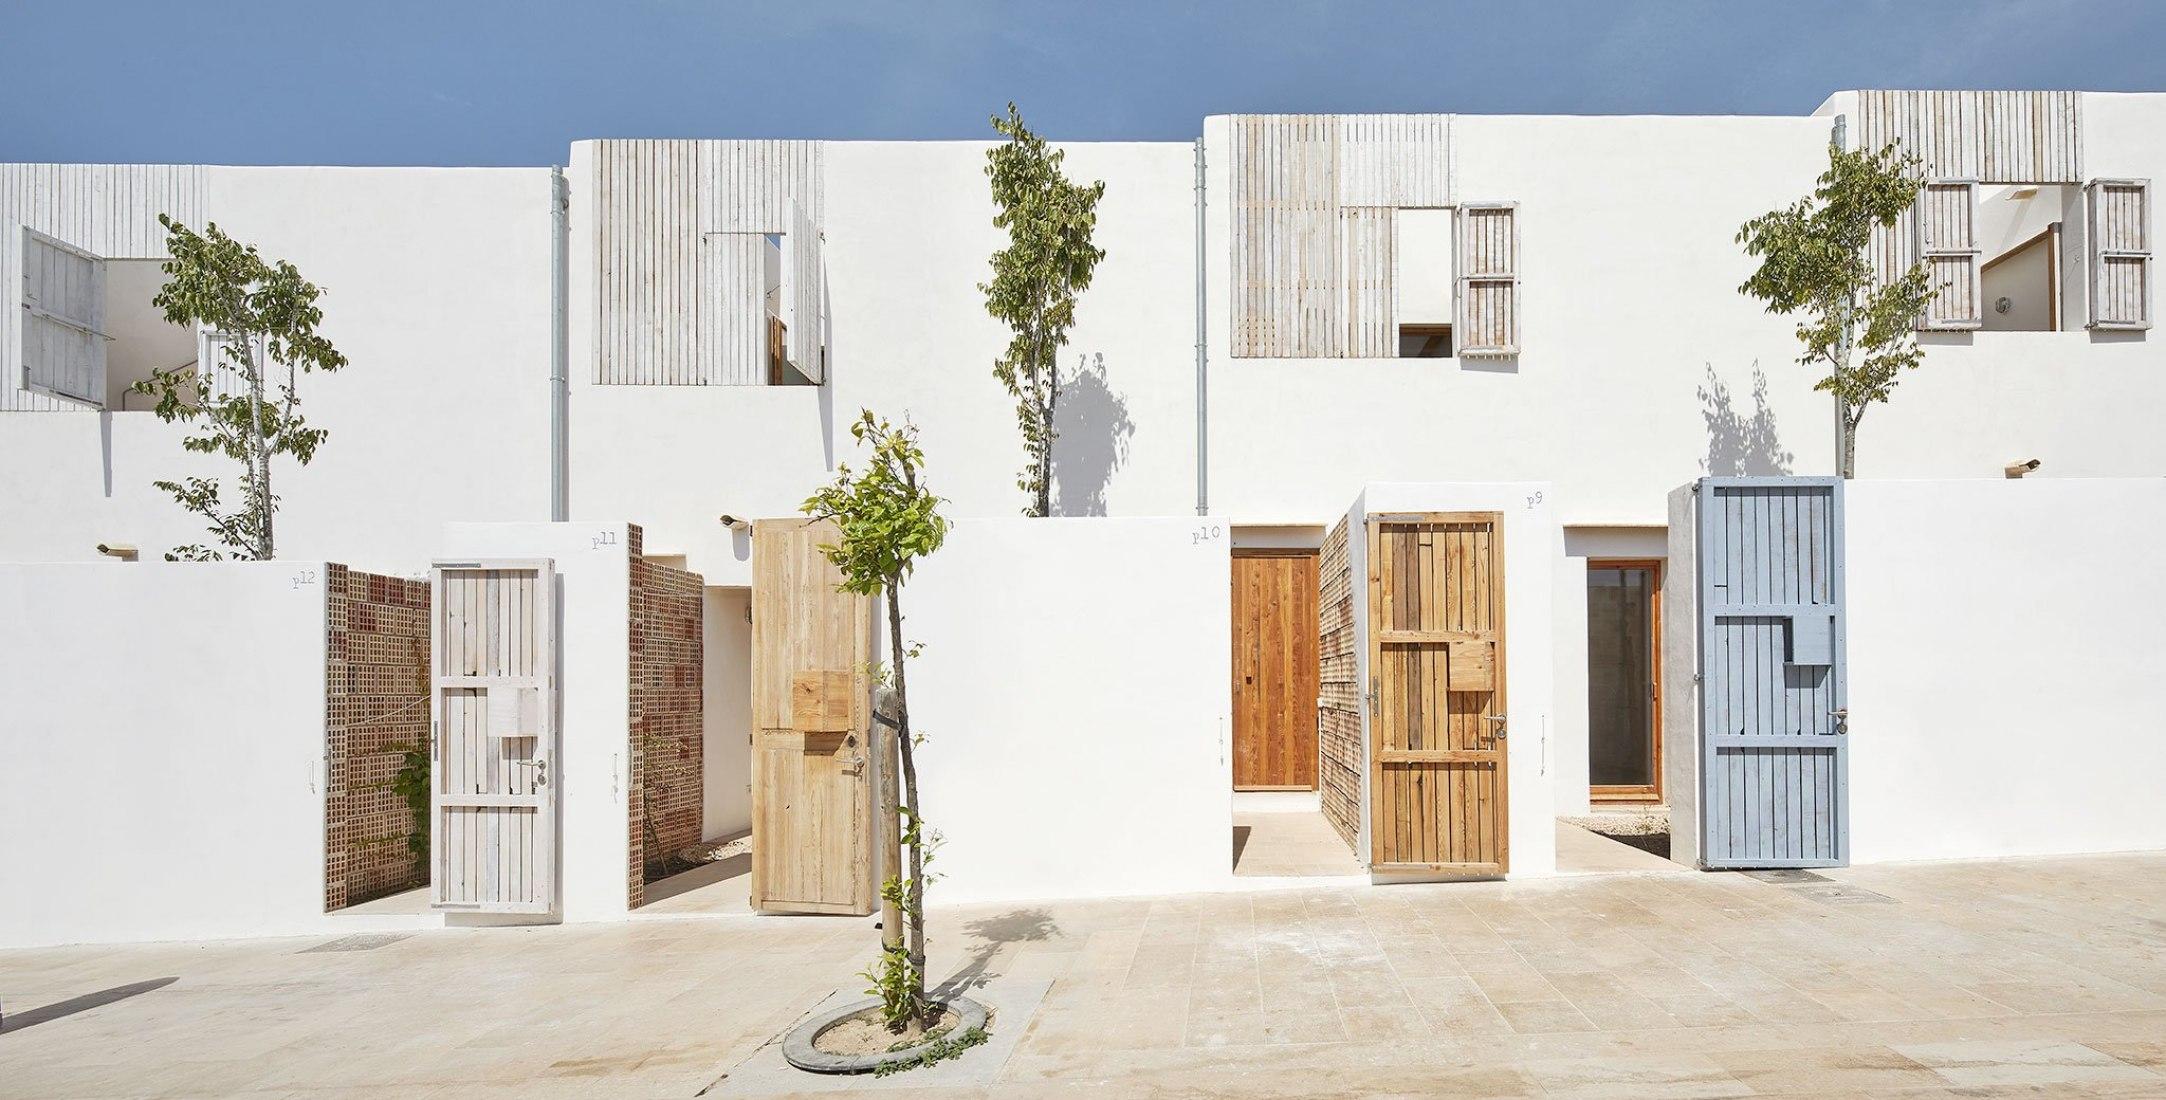 FAD architecture prize 2018. Life Reusing Posidonia/ 14 social housing at Sant Ferran, Formentera by Carles Oliver Barceló, Antonio Martín Procopio, Joaquín Moyá Costa, Alfonso Reina Ferragut. Photograph by José Hevia